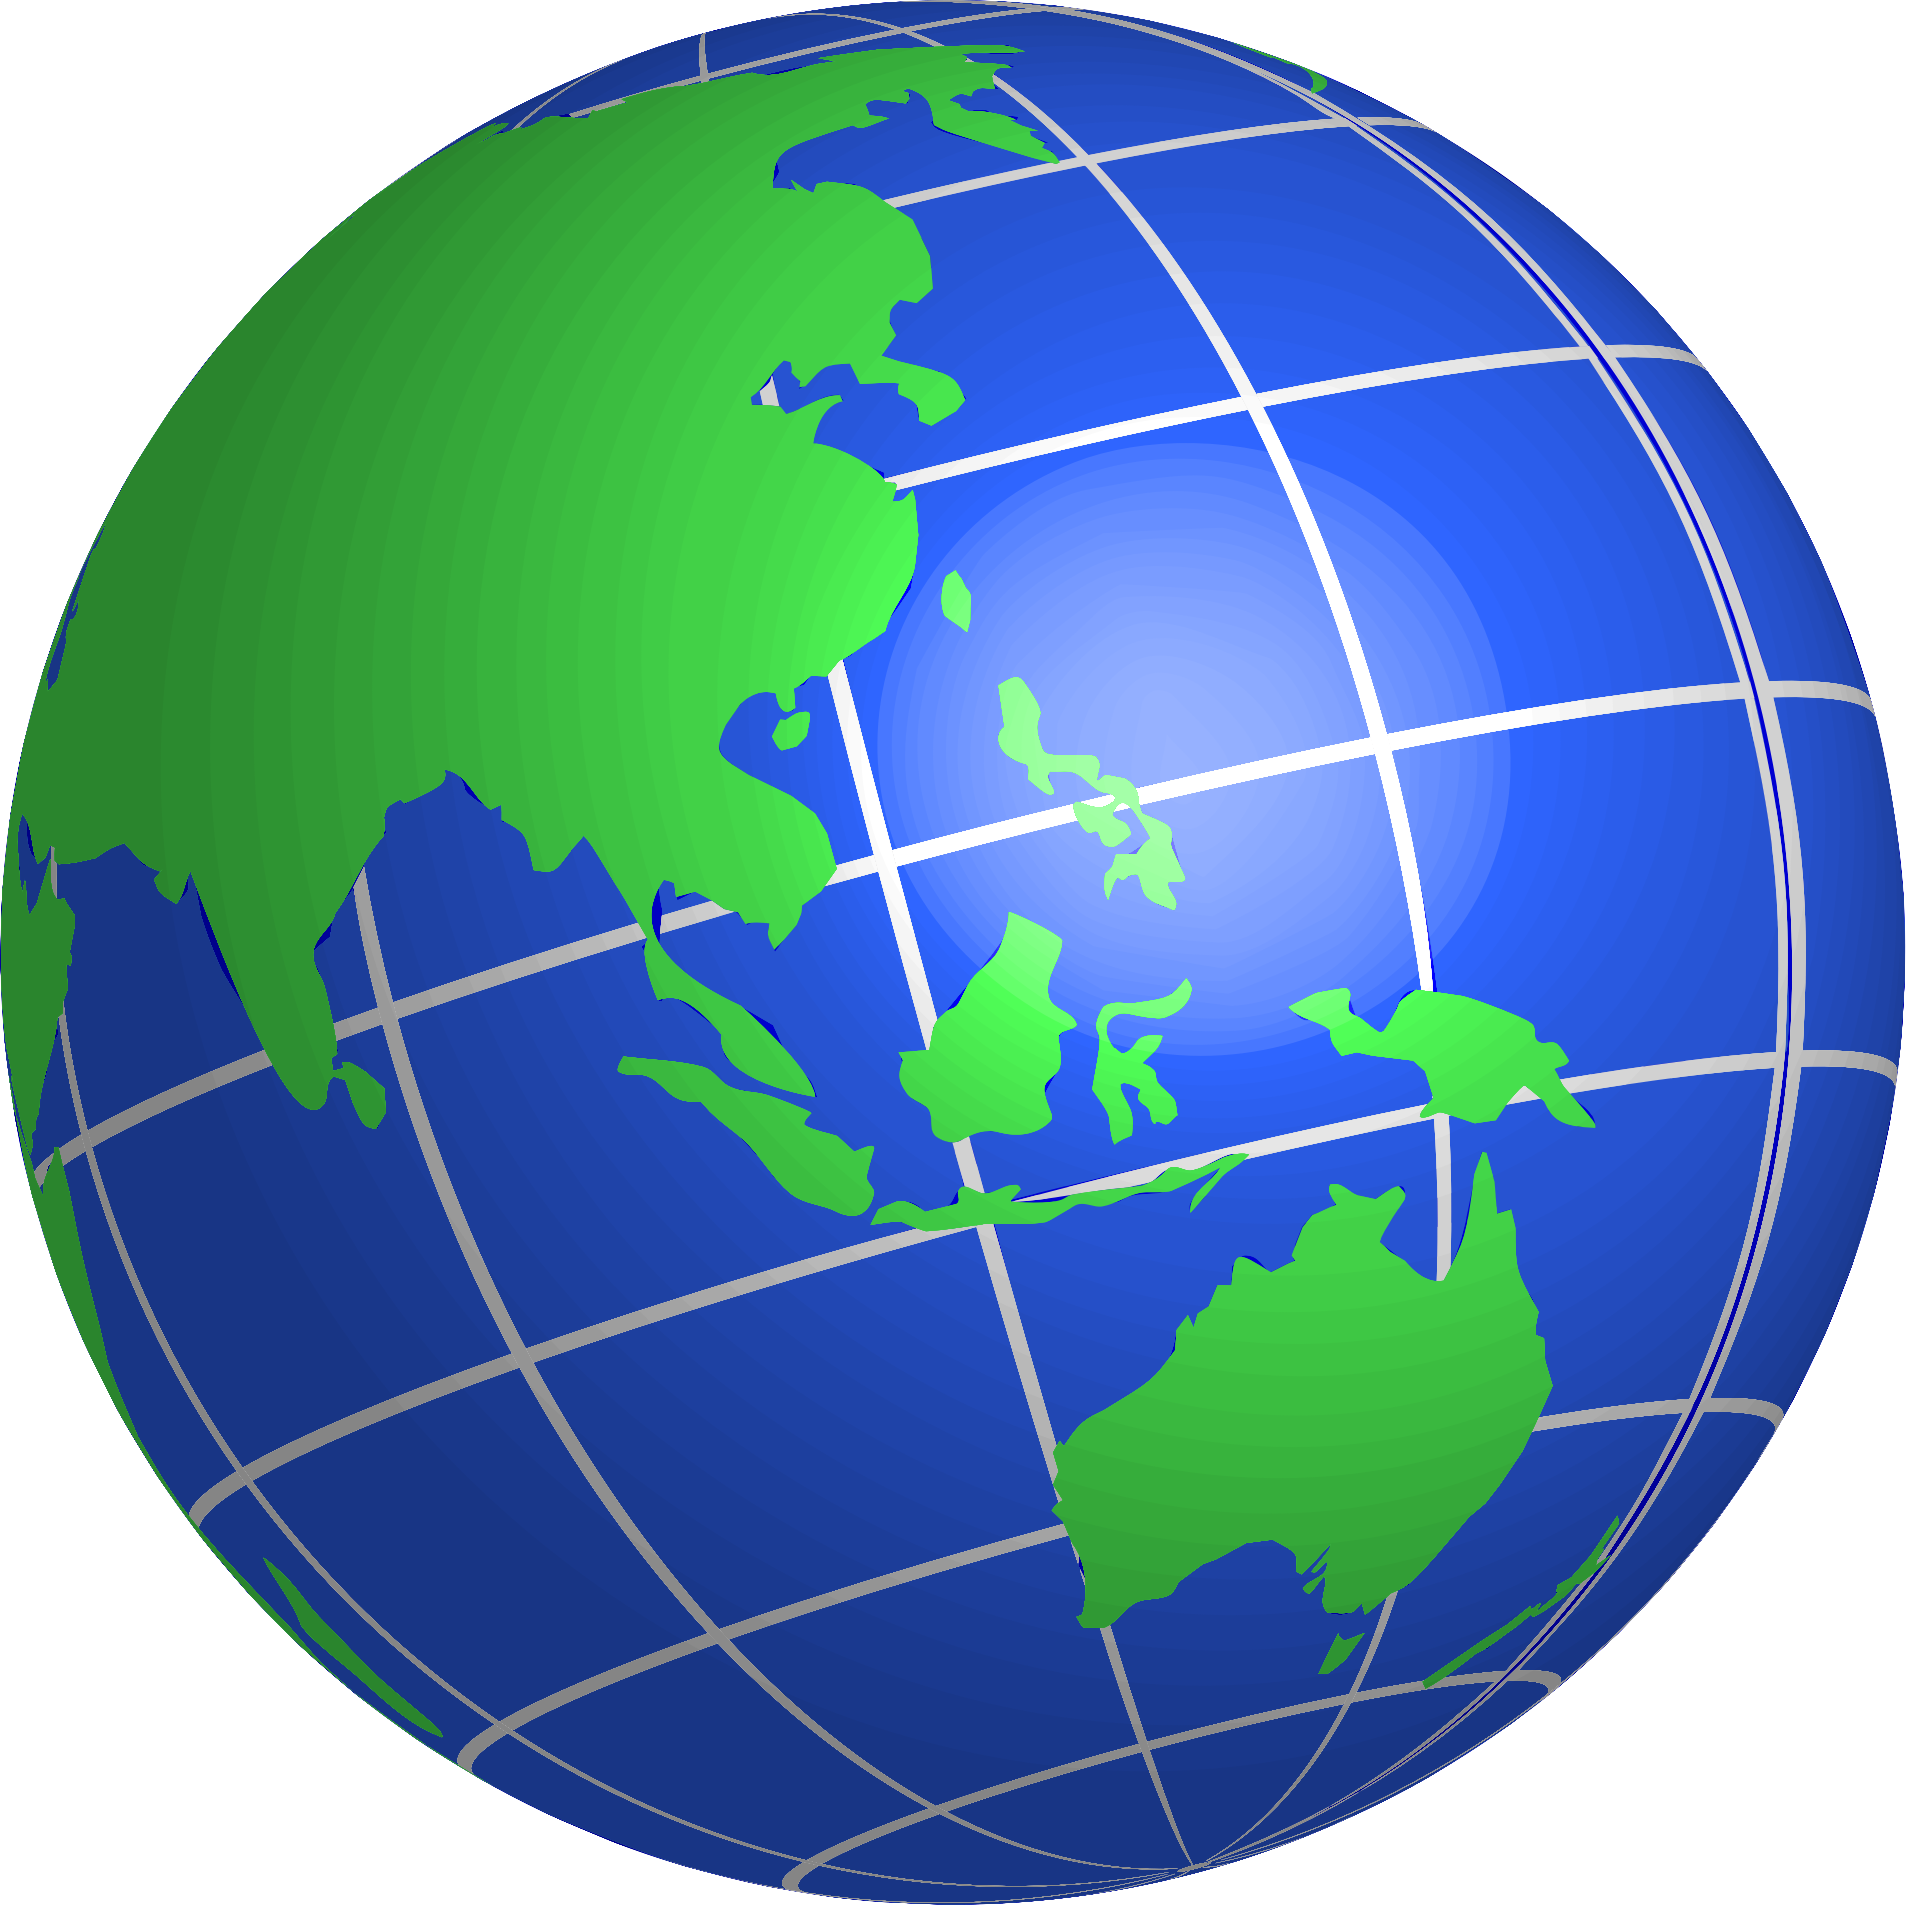 Free World Globe, Download Free Clip Art, Free Clip Art on.